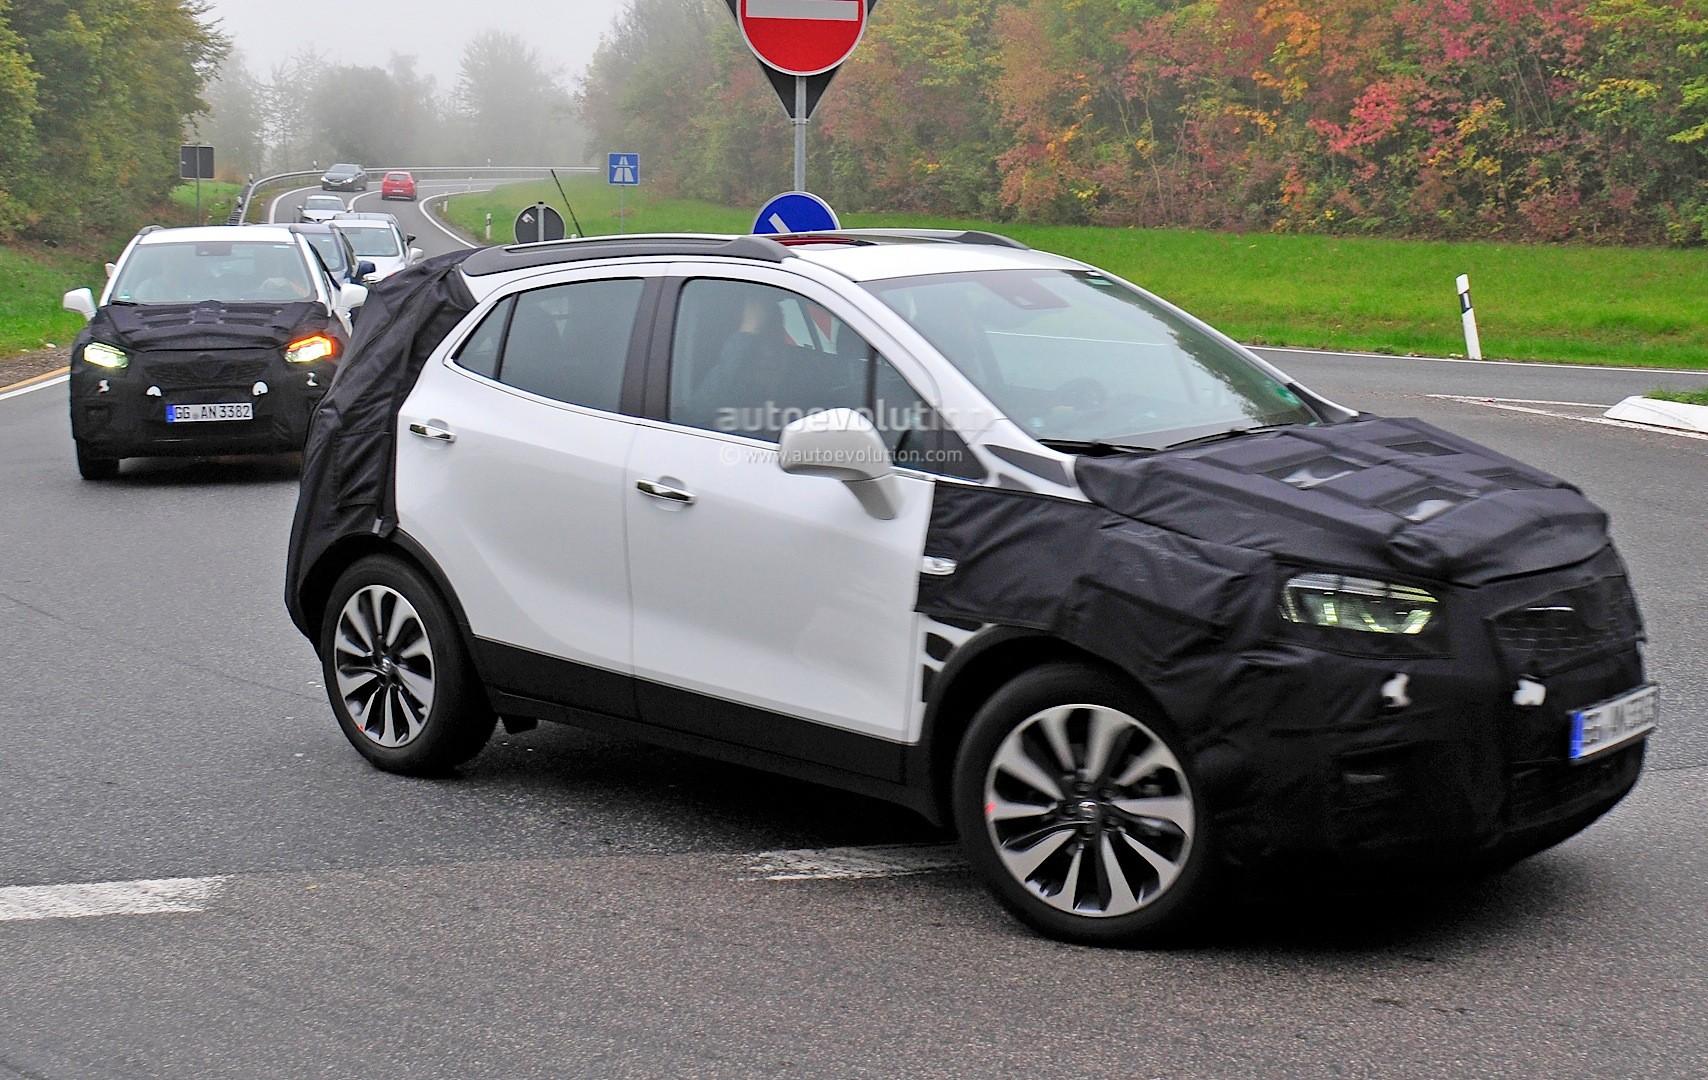 Astonishing Spyshots 2016 Opel Mokka Facelift Getting Led Headlights Wiring 101 Capemaxxcnl